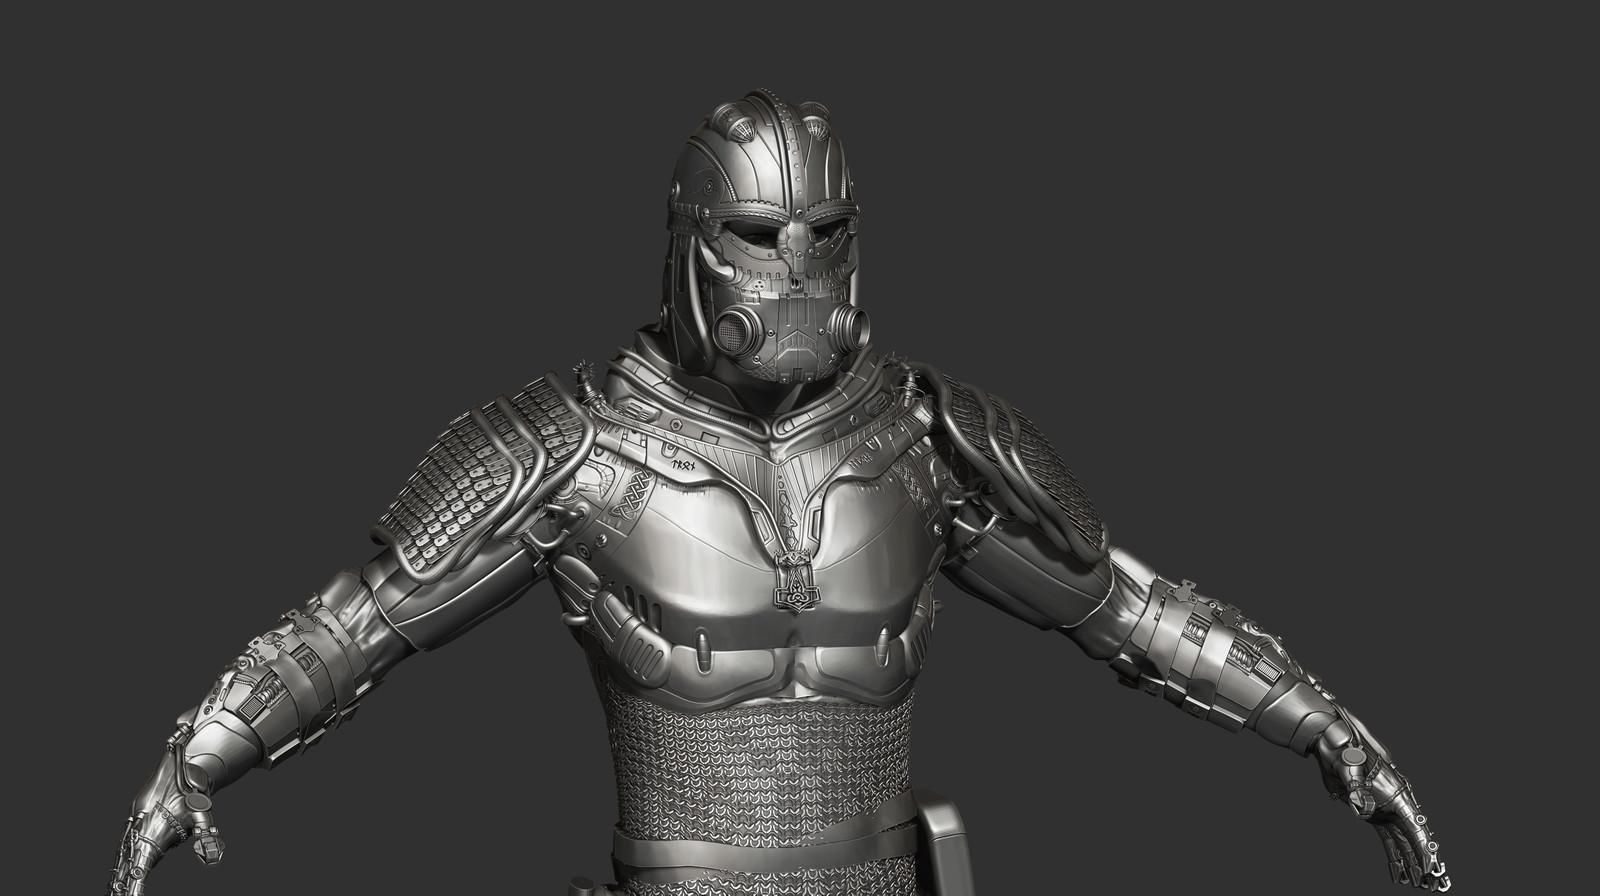 Futuristic Viking Soldier - WIP